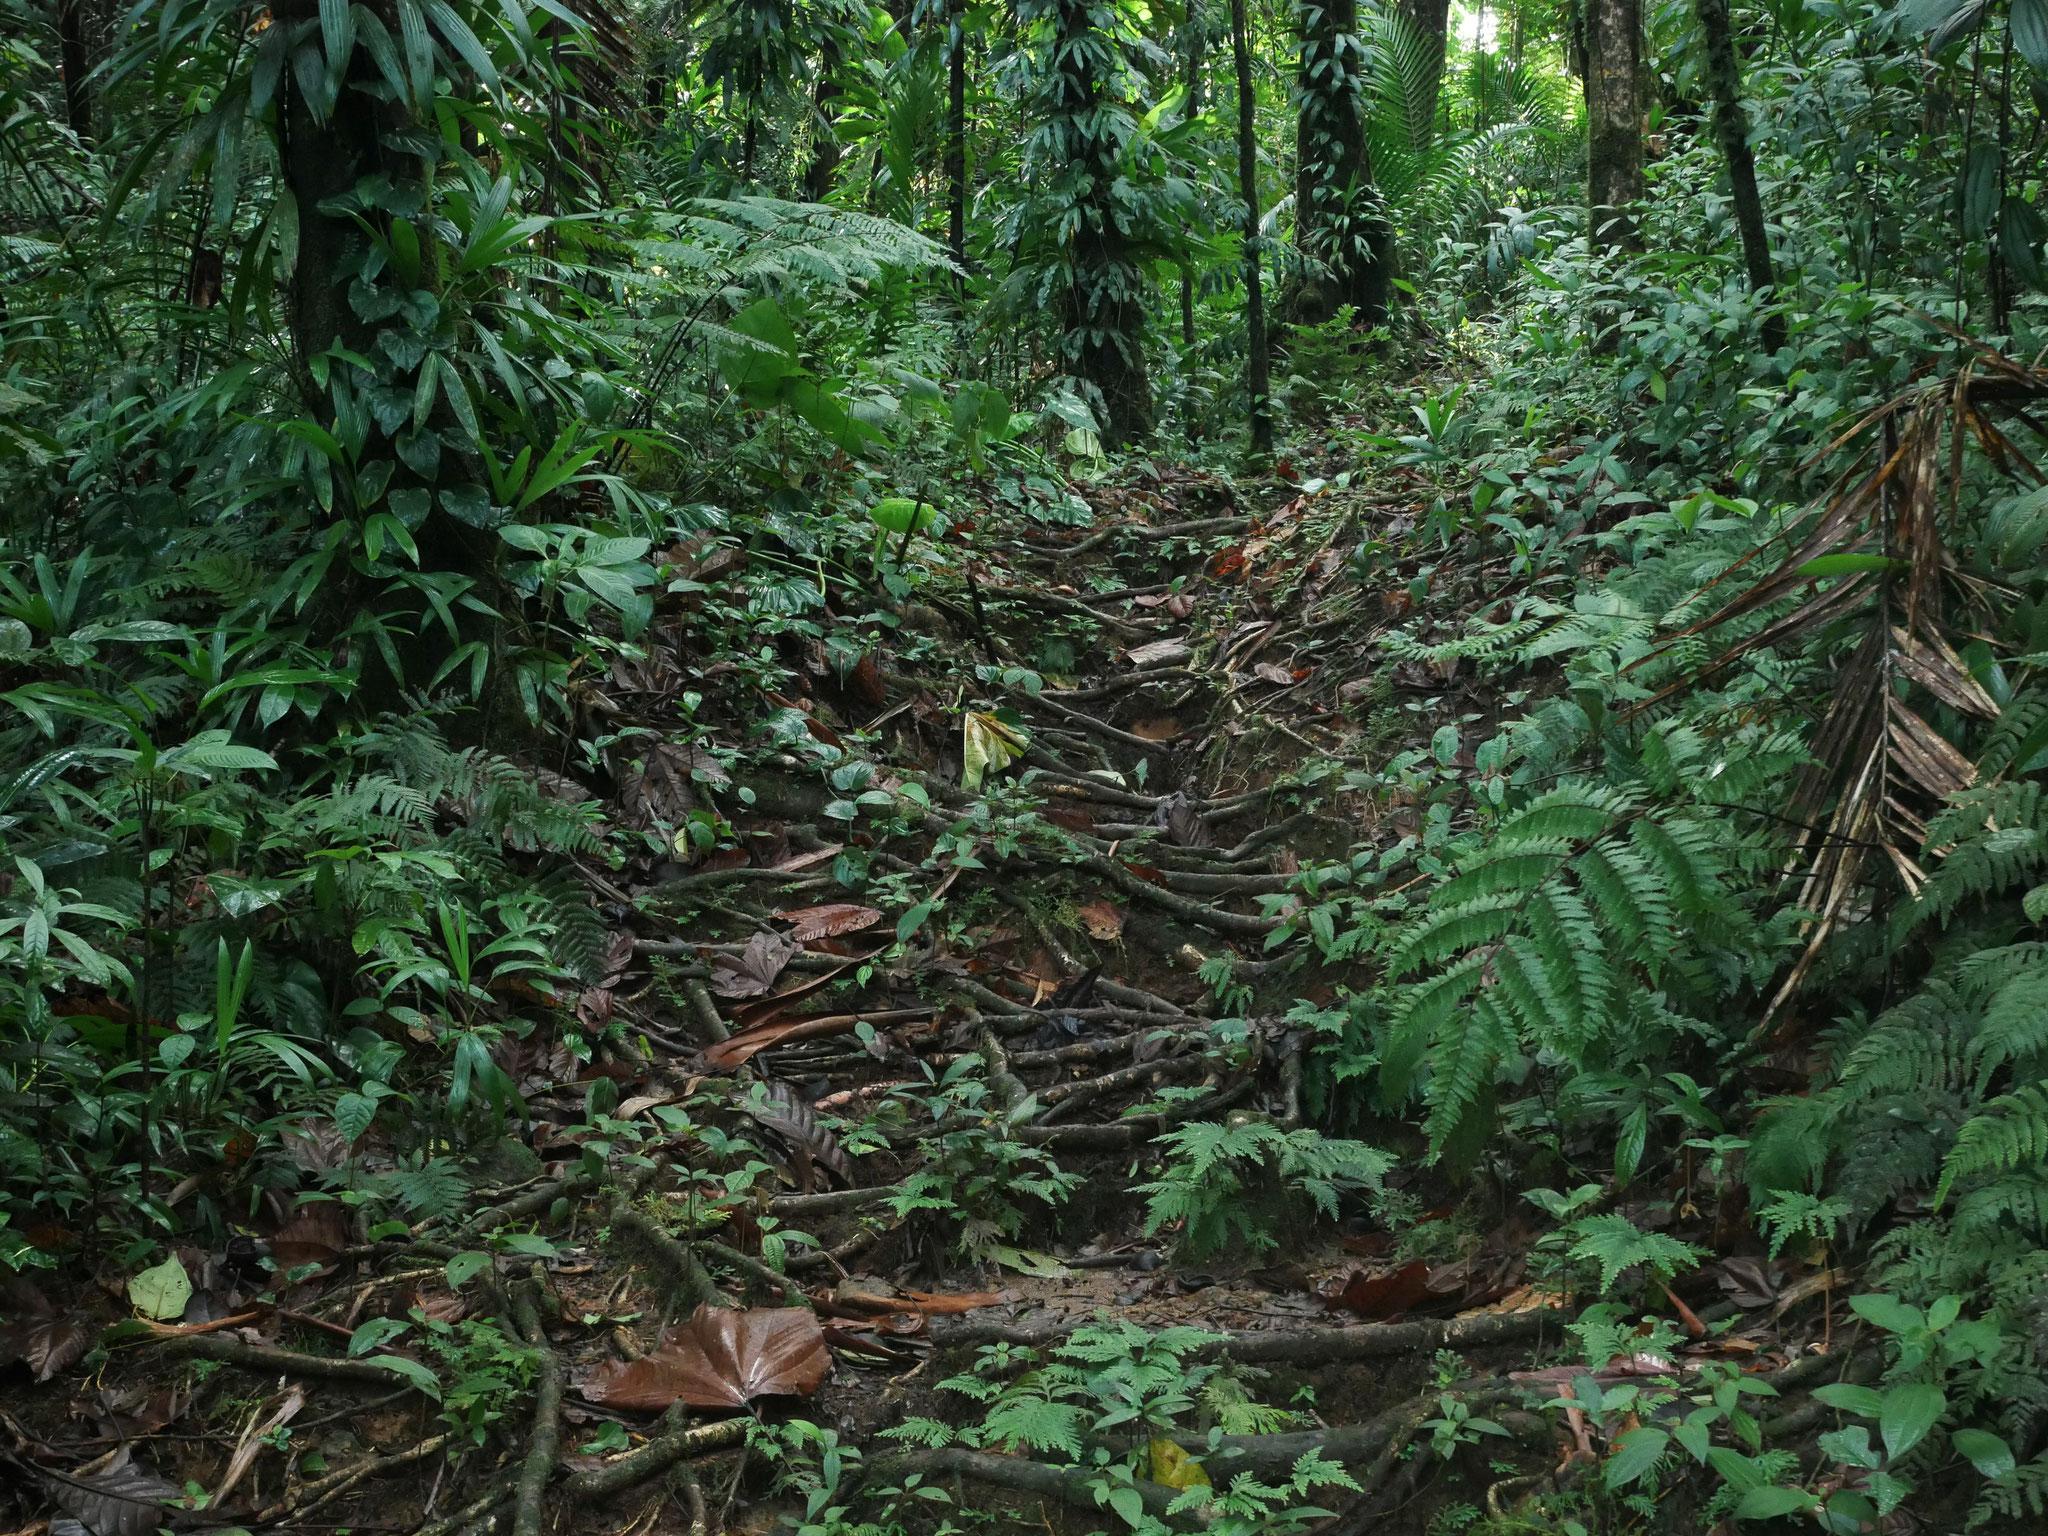 Le chemin sur un entrelacs de racines